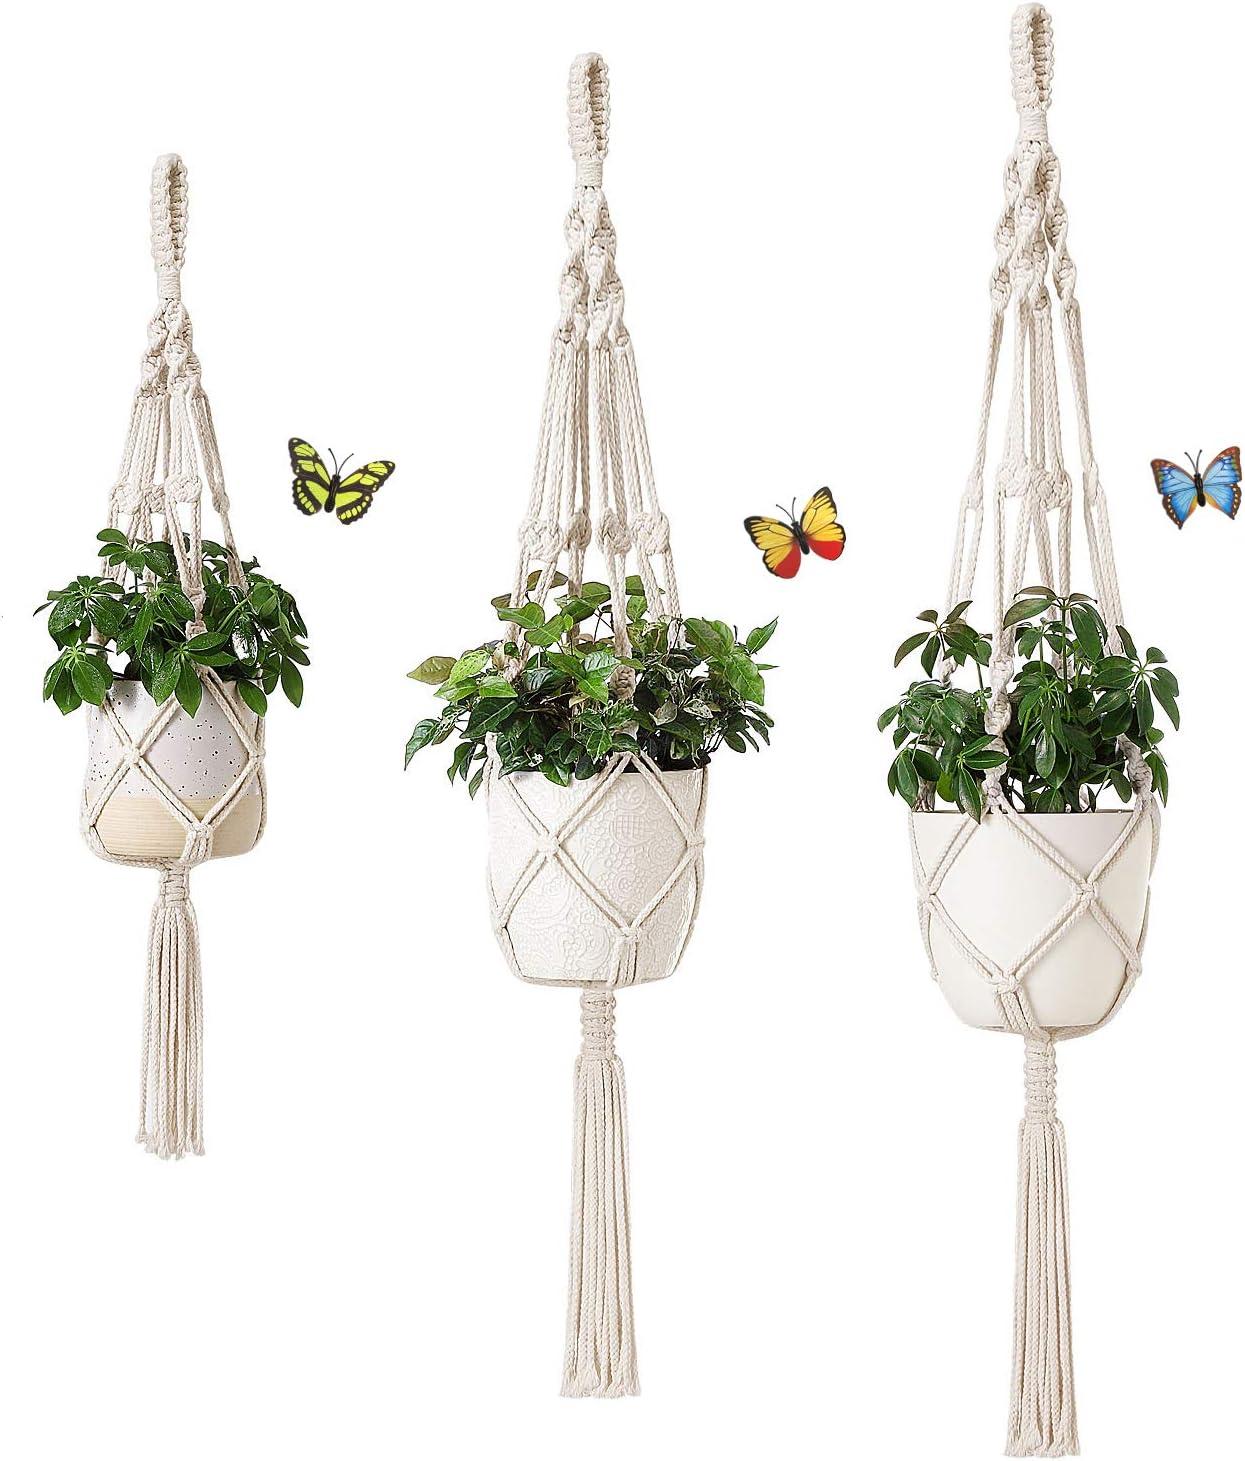 Dahey Macrame Plant Hangers, 3 Different Sizes Indoor Outdoor Ceiling Planters Hanging Plant Basket Cotton Rope Flower Pot Holder Modern Boho Home Decor